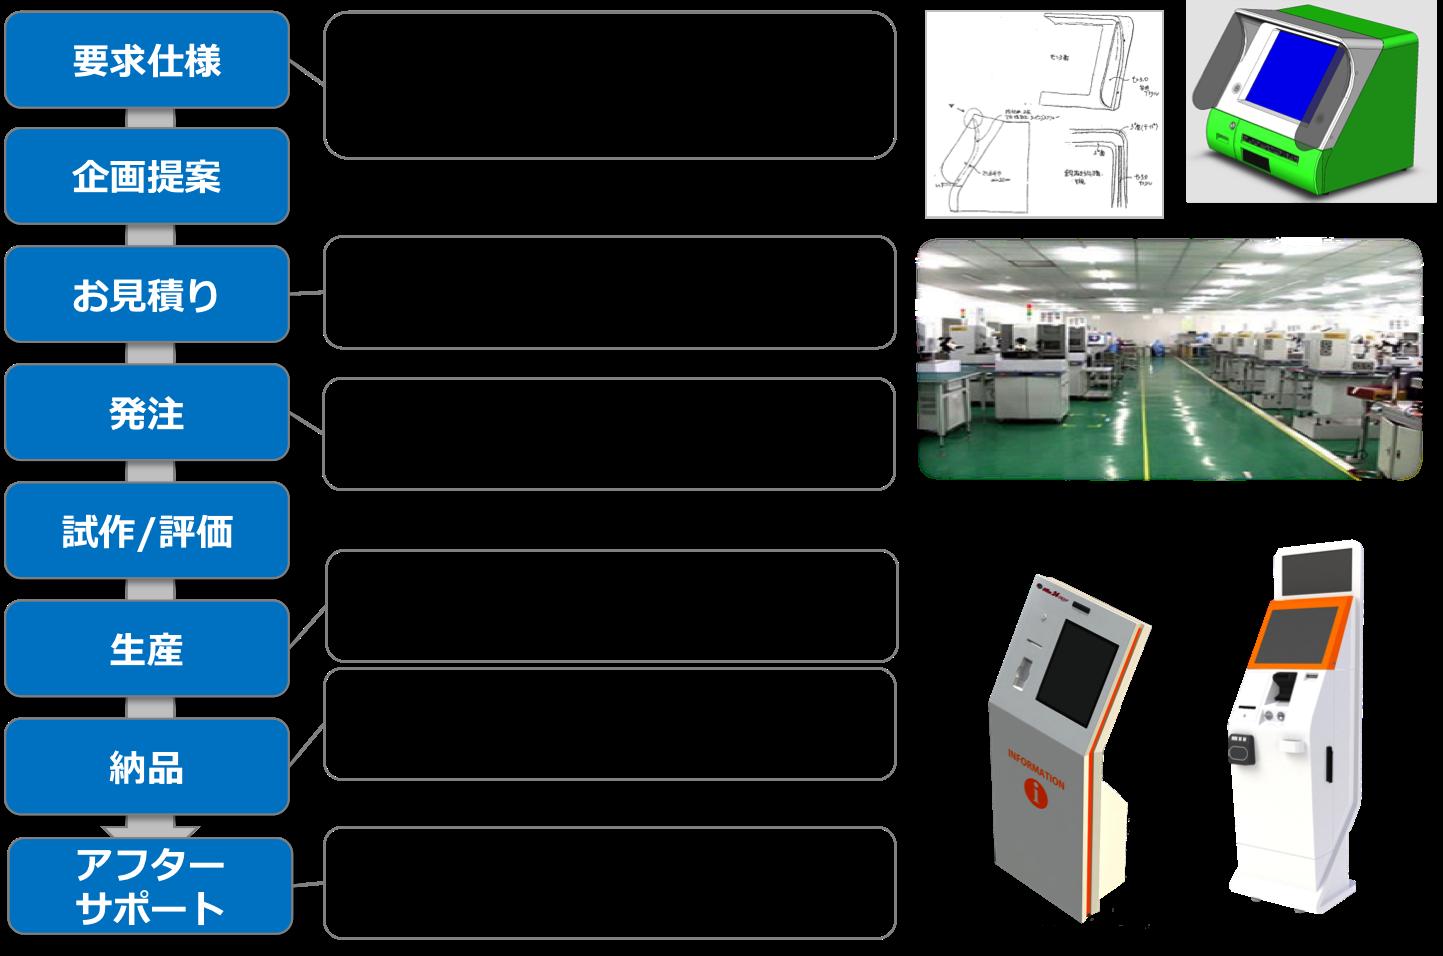 KIOSK端末・自動精算機 開発の流れ